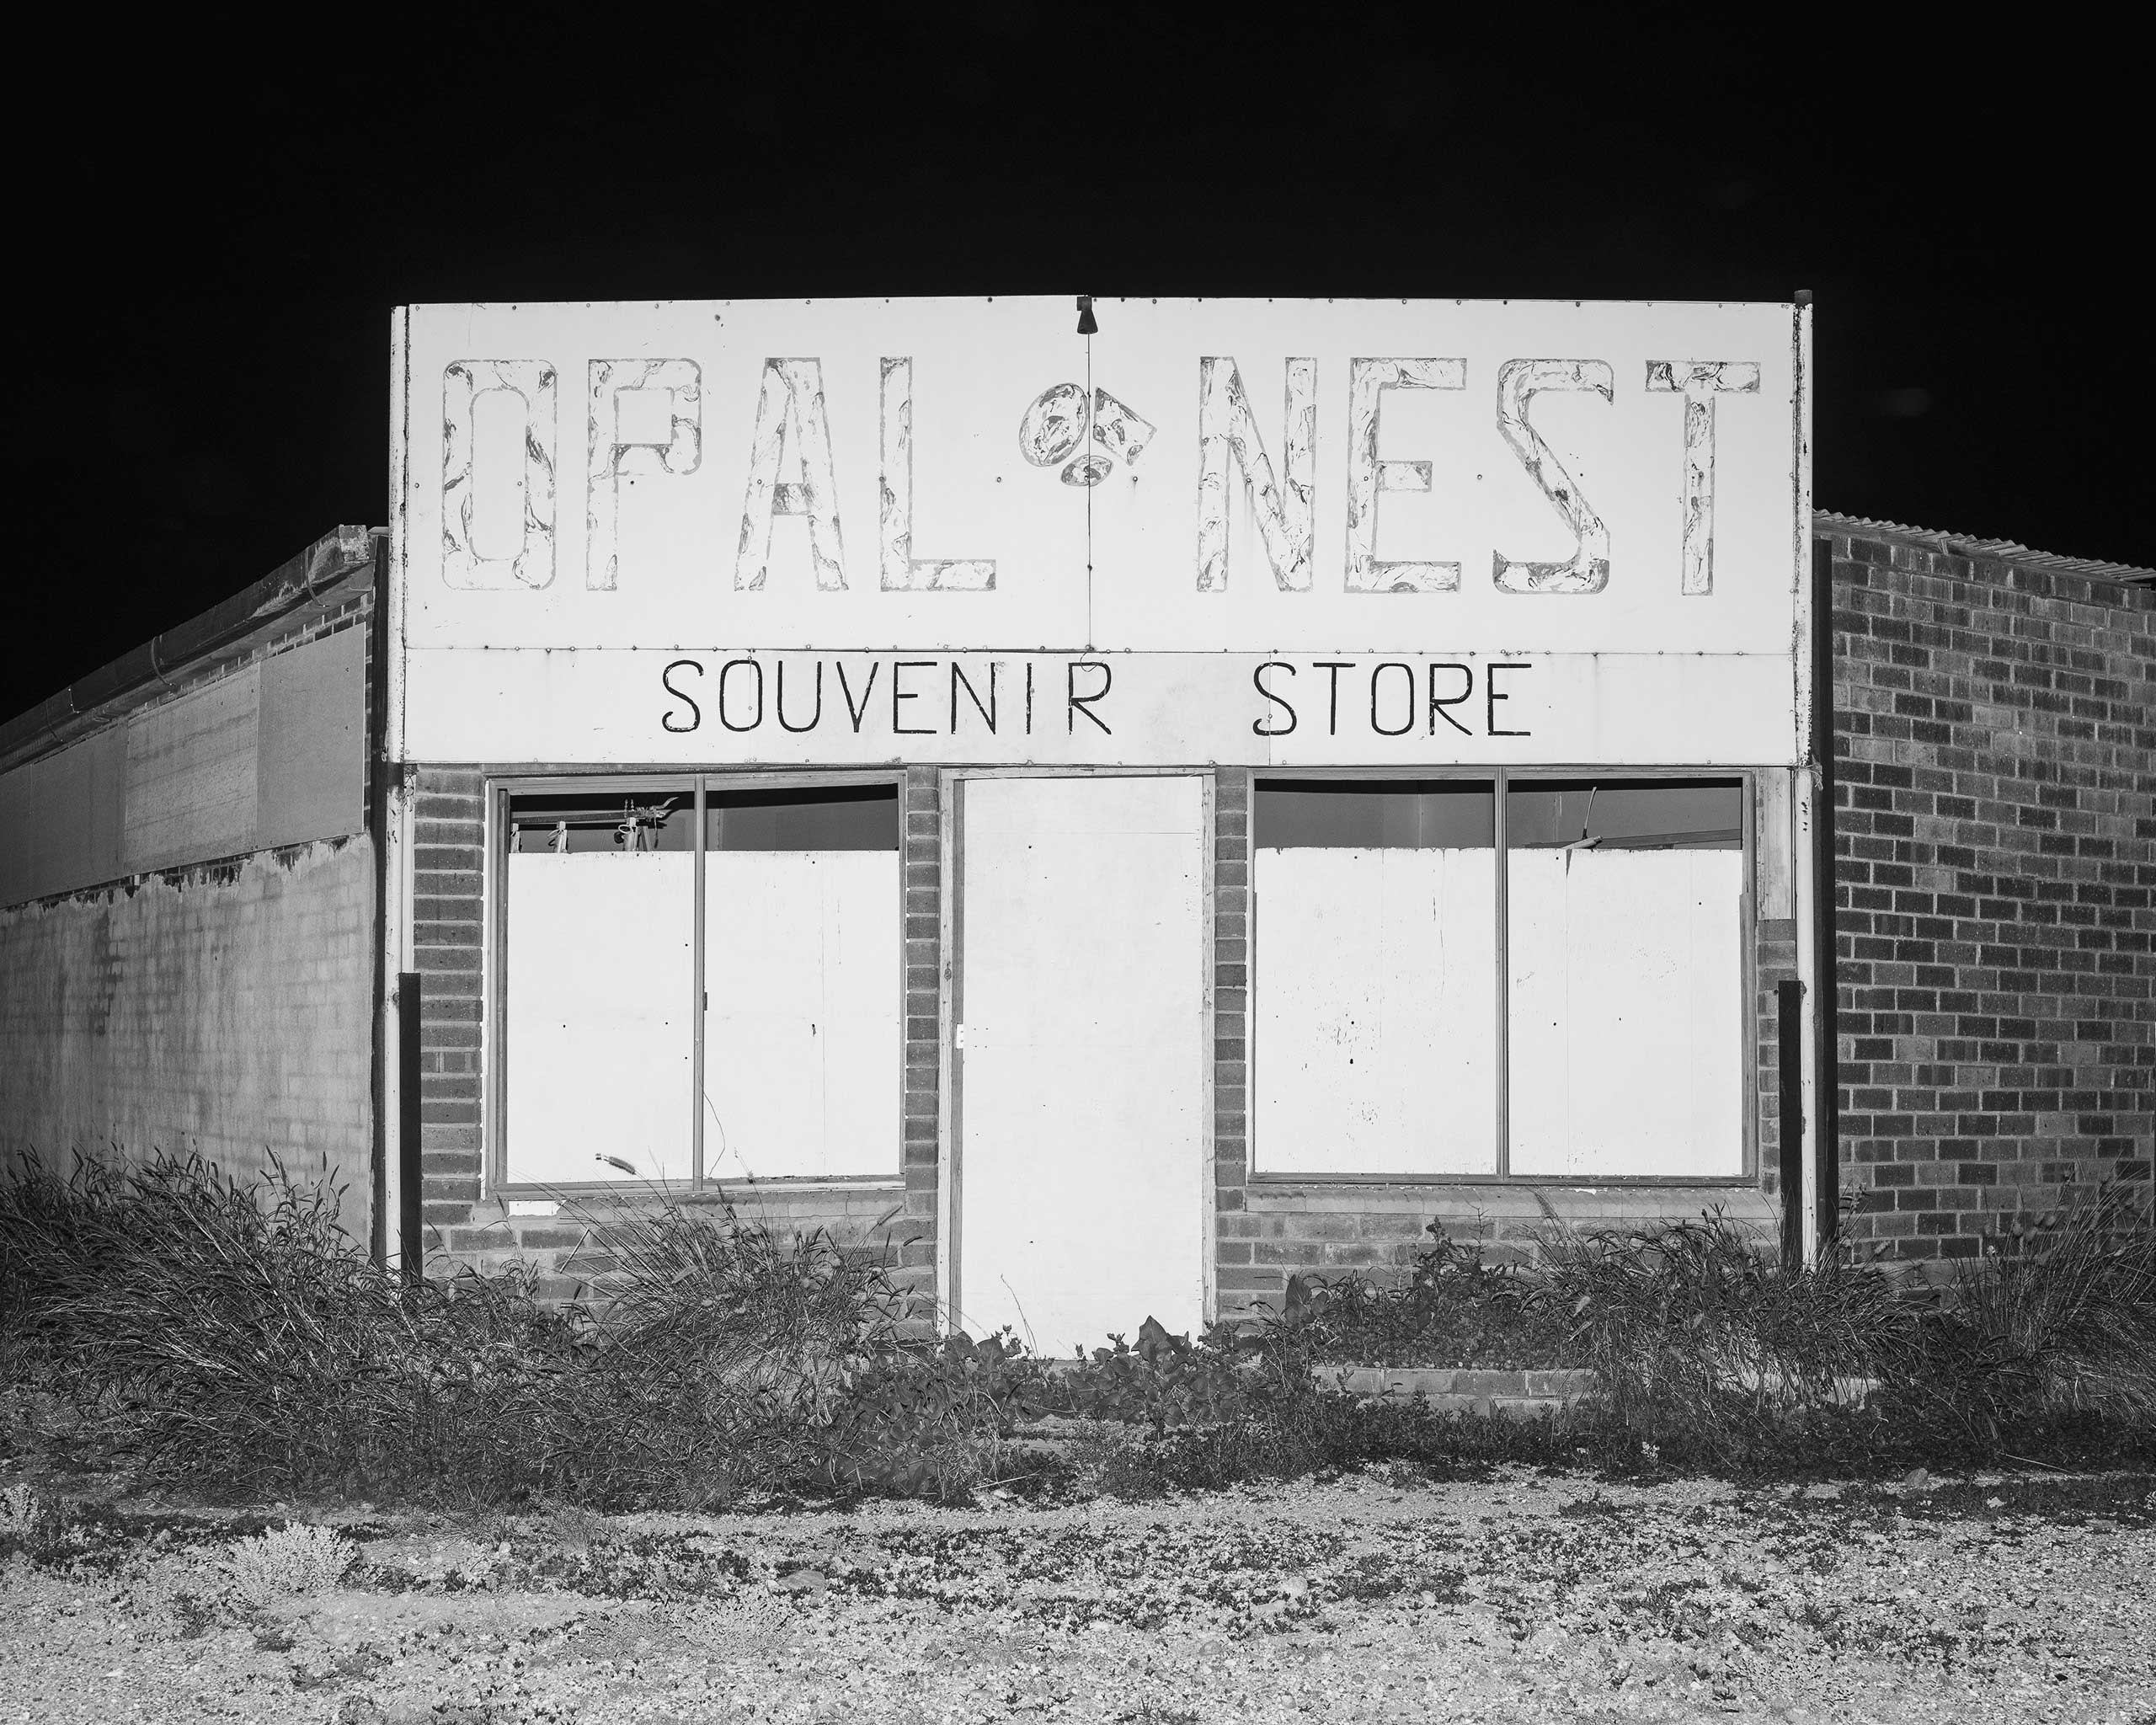 Souvenir Store, Coober Pedy, Australia, 2016.